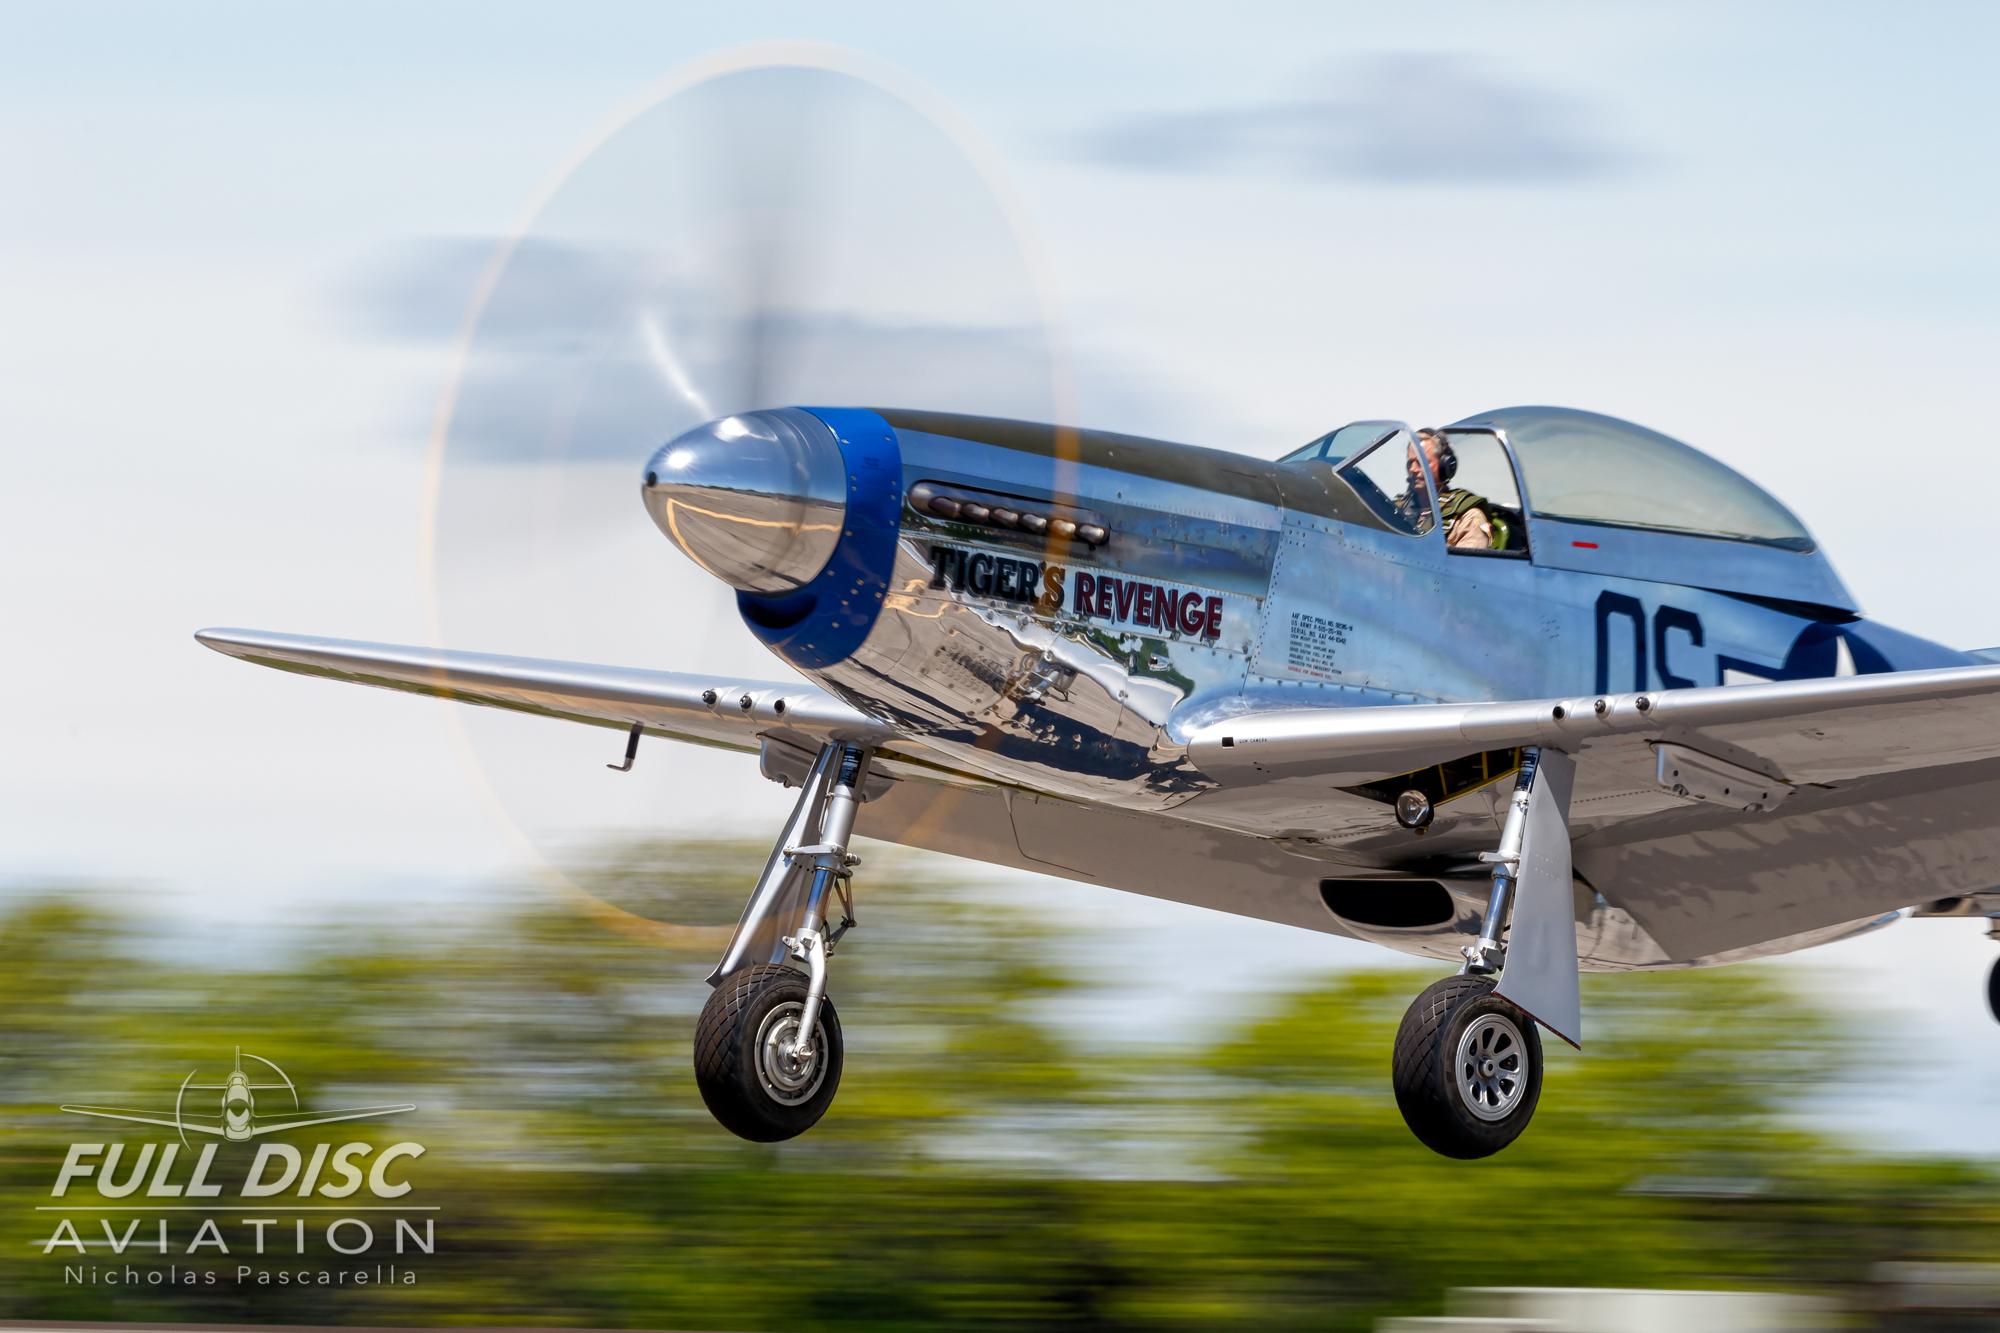 americanairpowermuseum_nicholaspascarella_nickpascarella_fulldiscaviation_legendsofairpower2019_aviation_warbird_p51_landing_mustang_tigersrevenge.jpg